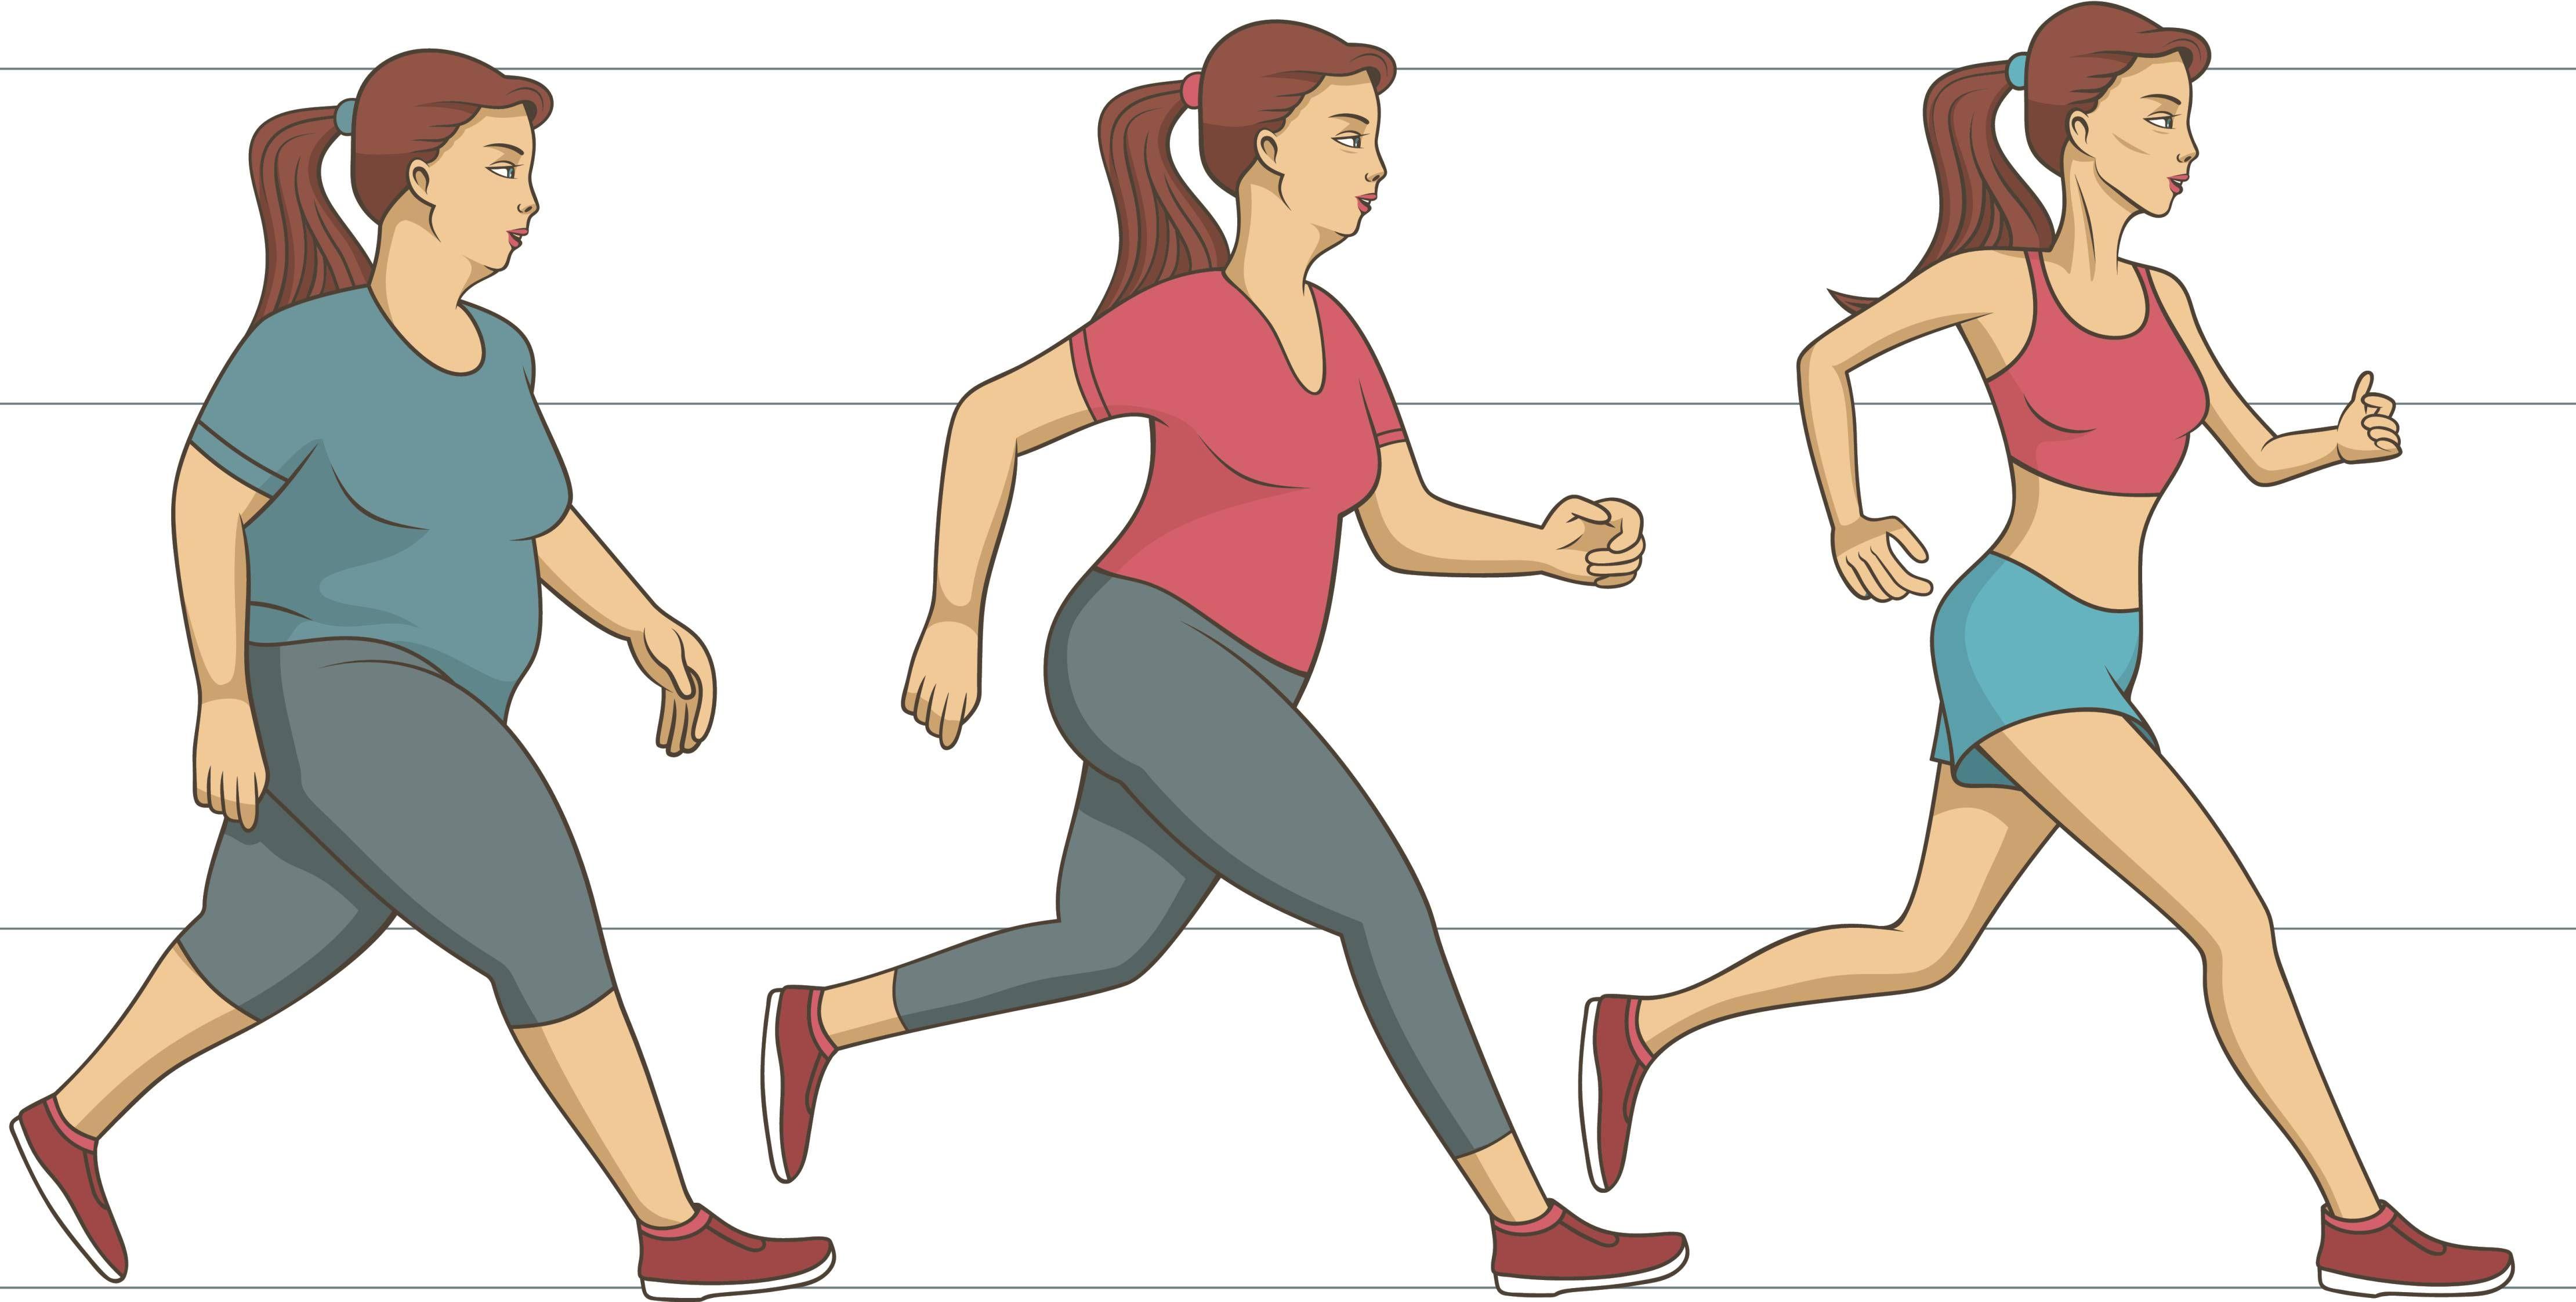 perdita di peso 5 al mese